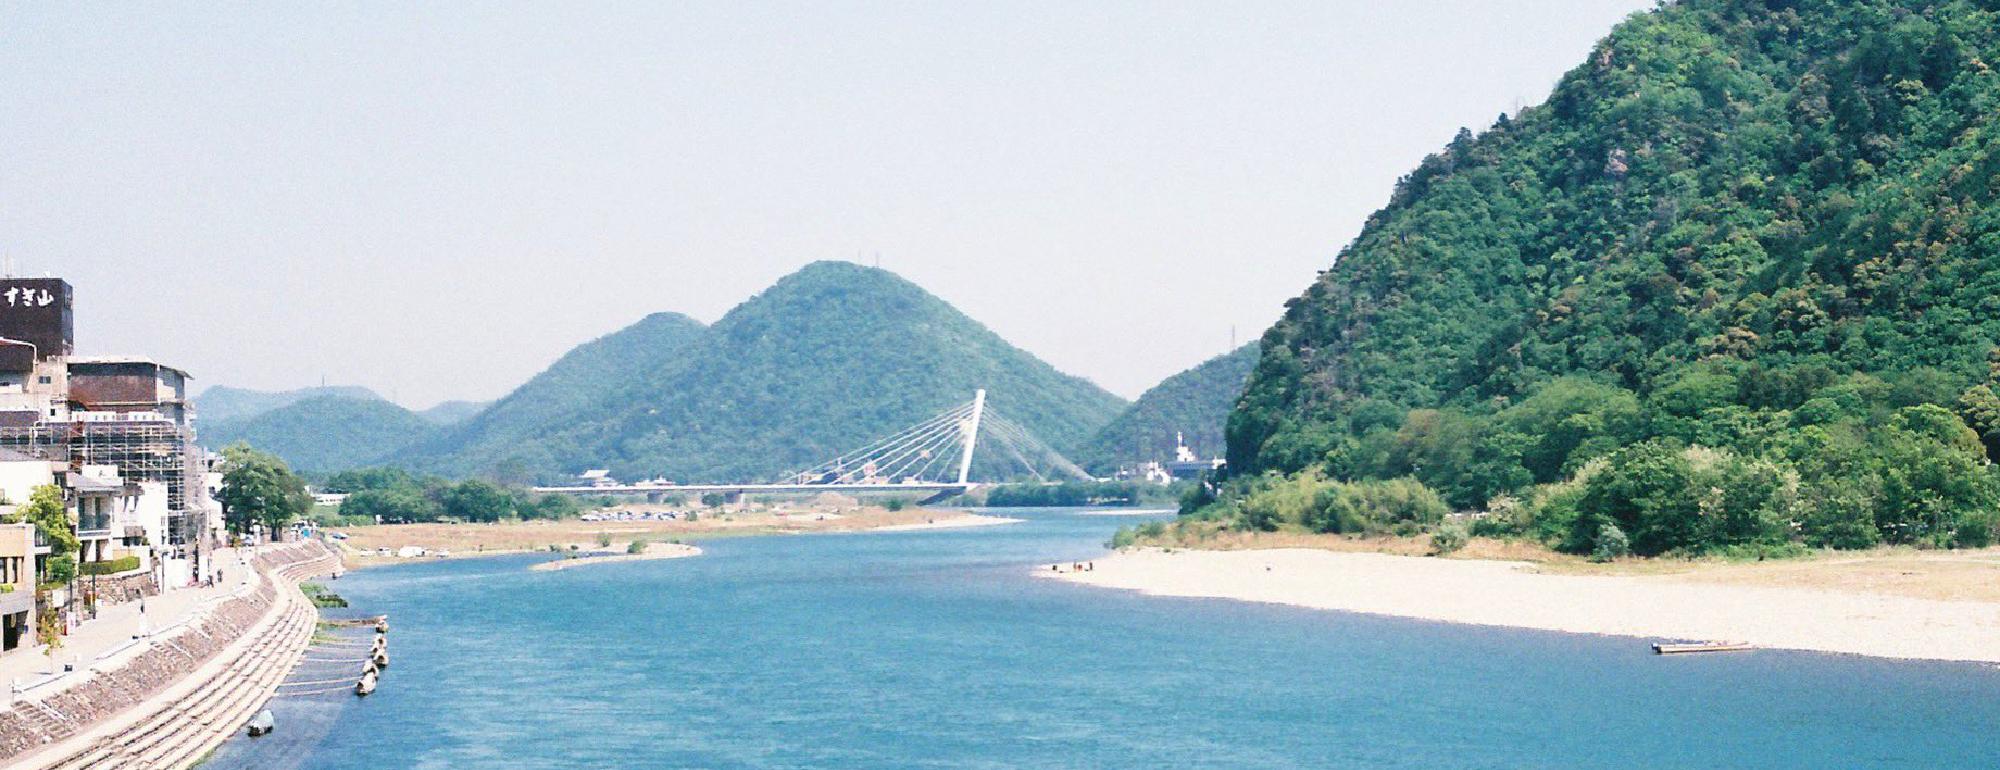 gifudiary|岐阜のウェブマガジン